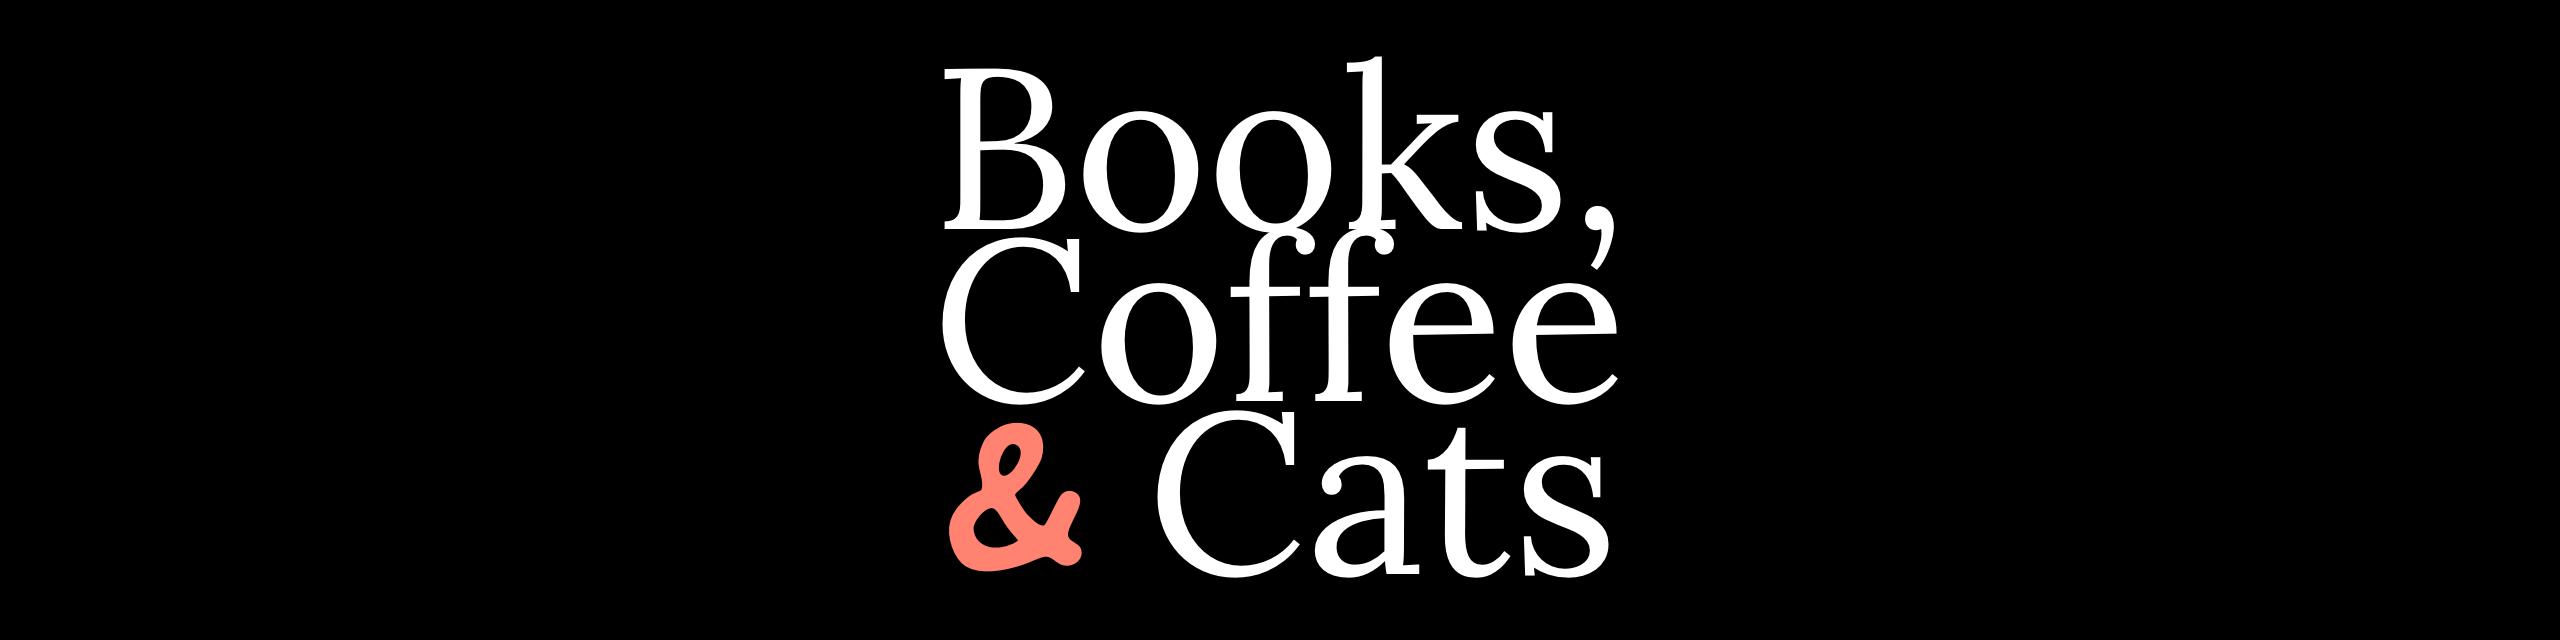 Books, Coffee & Cats